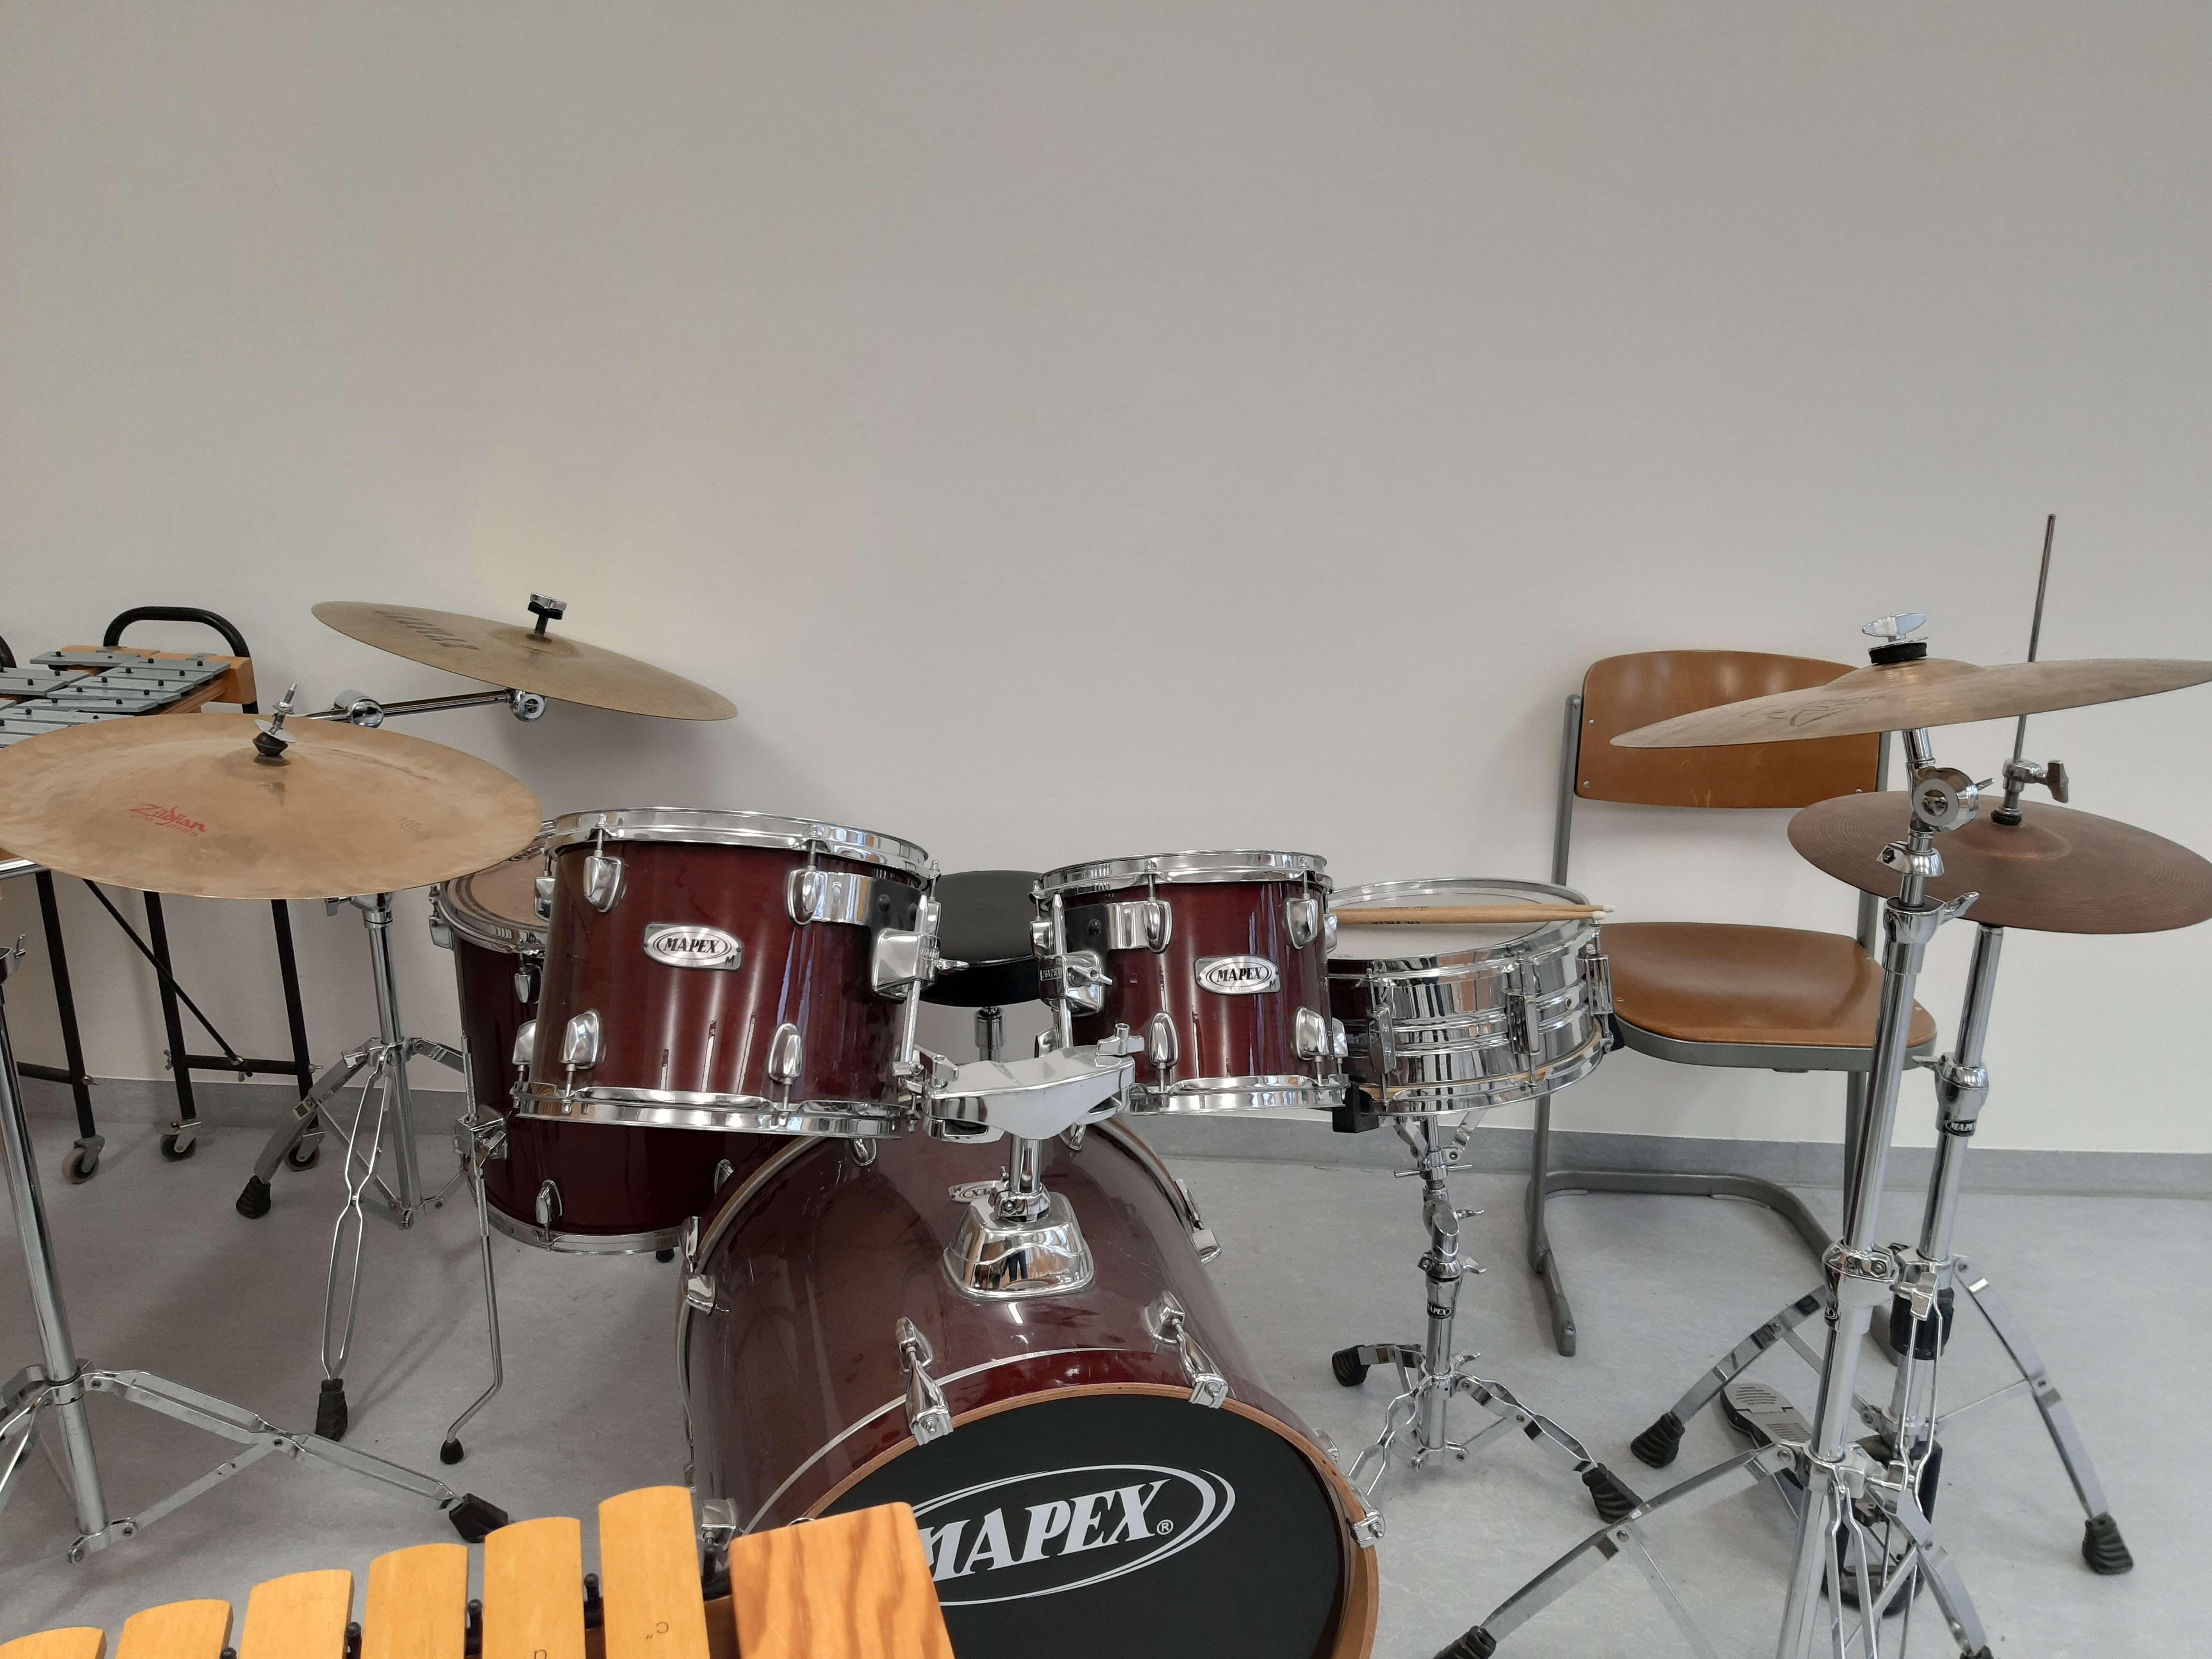 Schlagzeug.jpg?auto=compress,format&colorquant=1600